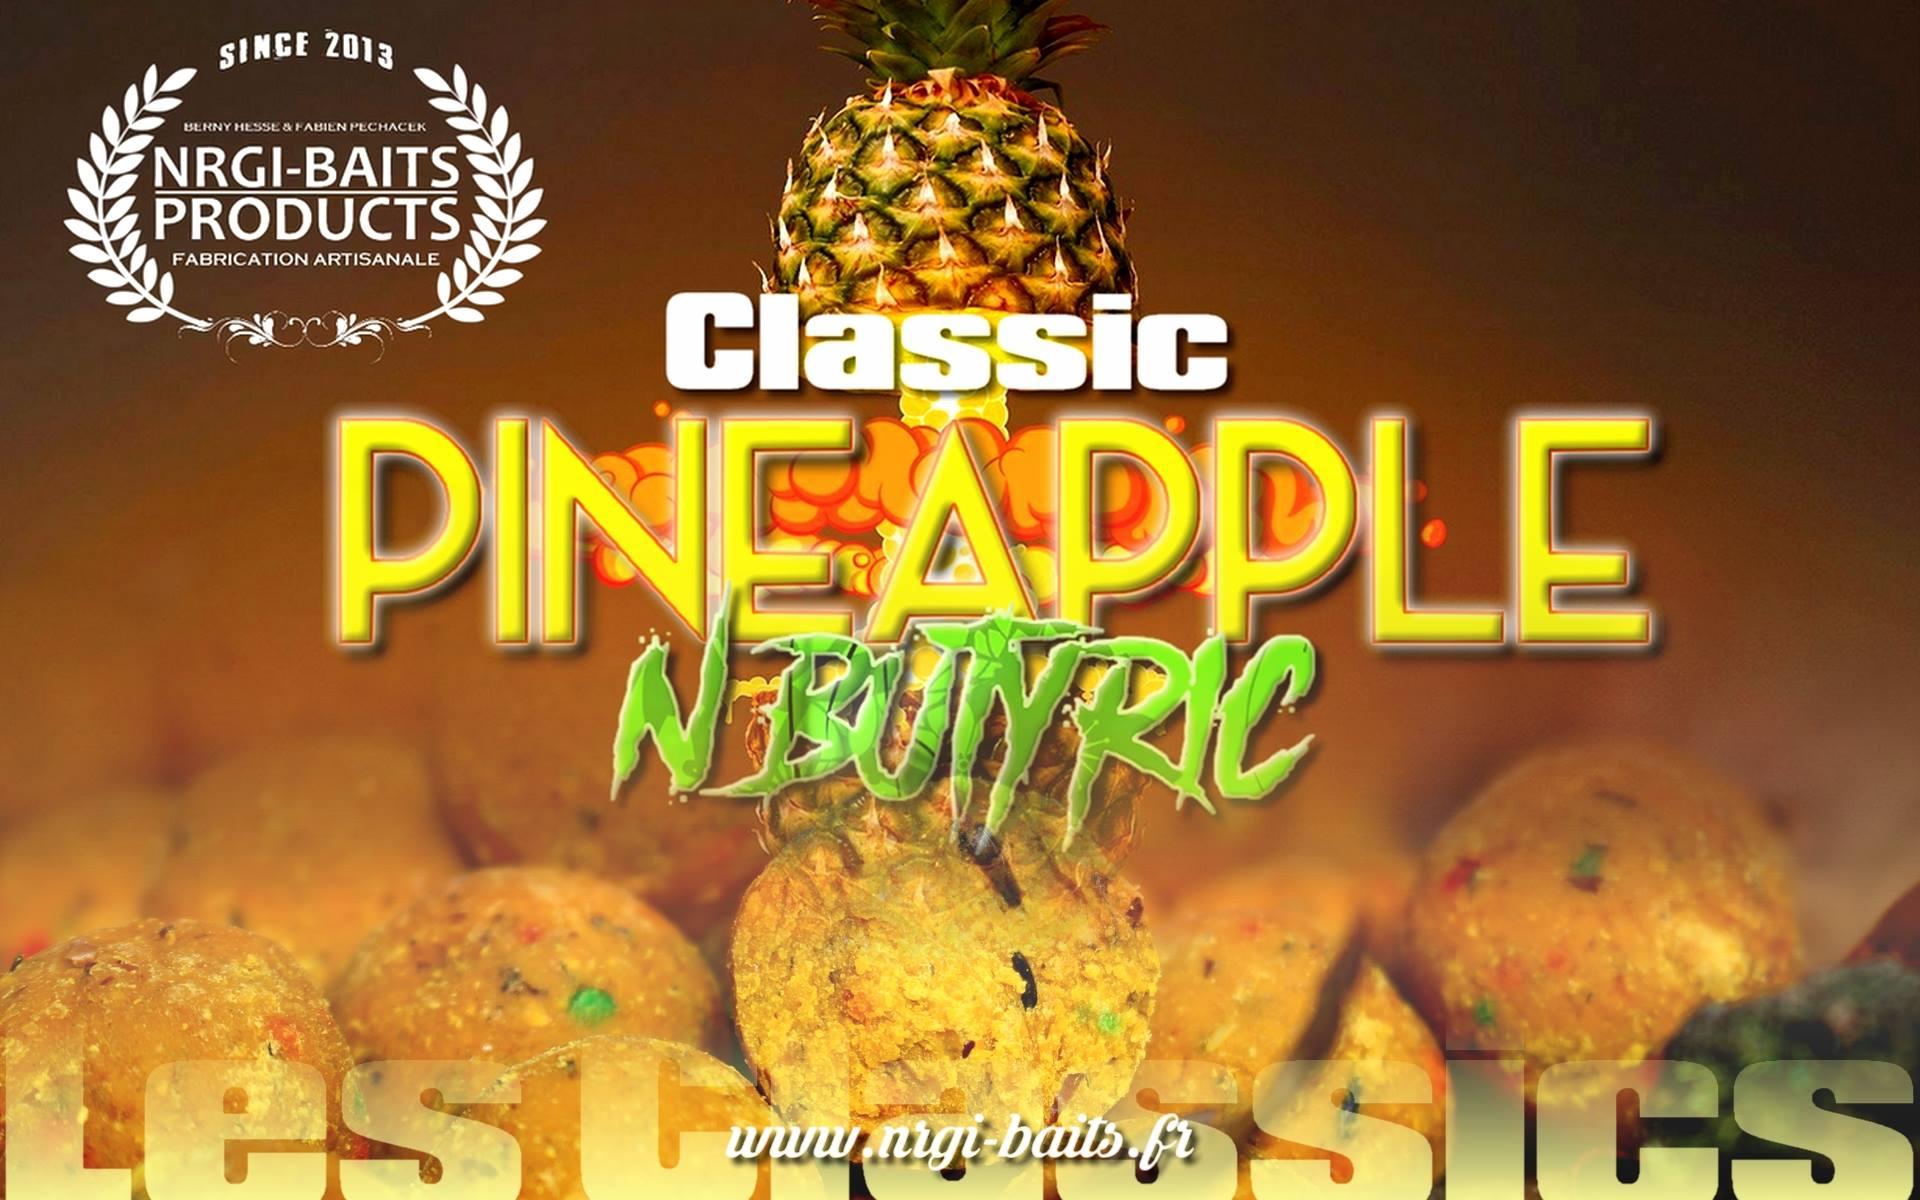 Gamme Classic Pineapple N'Butyric